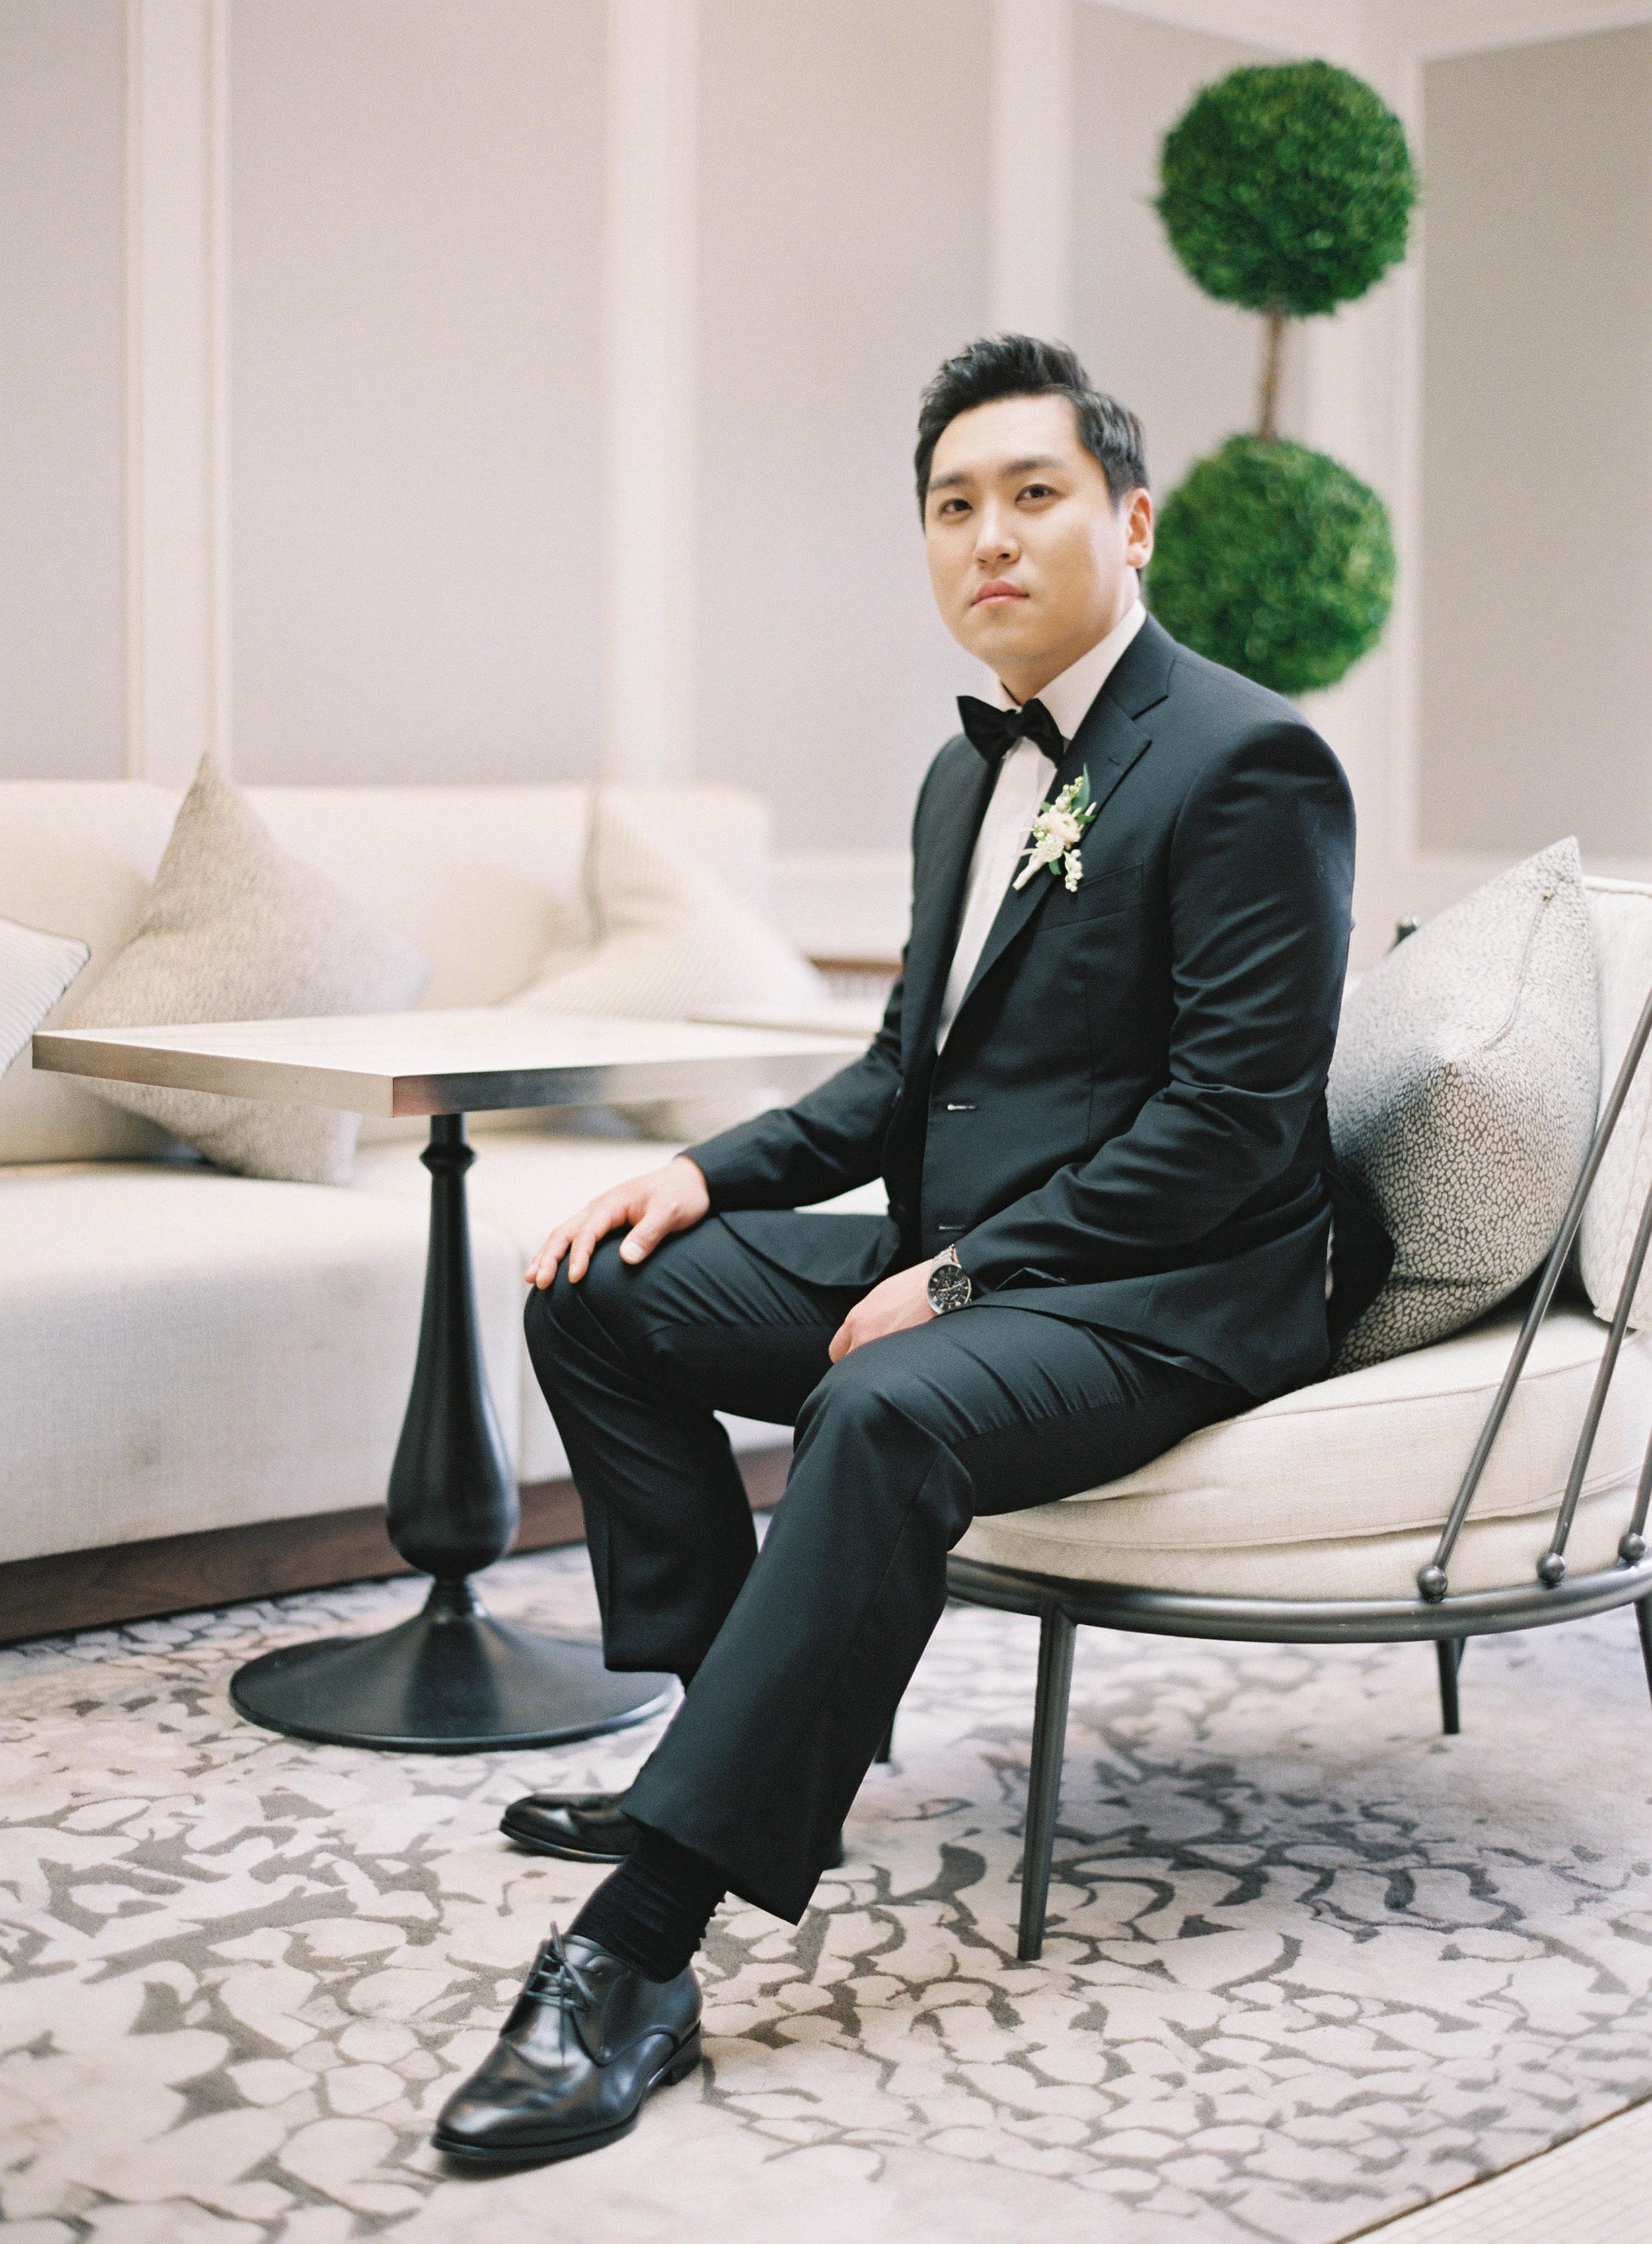 JS-Editorial-36-Jen-Huang-003026-R1-012.jpg